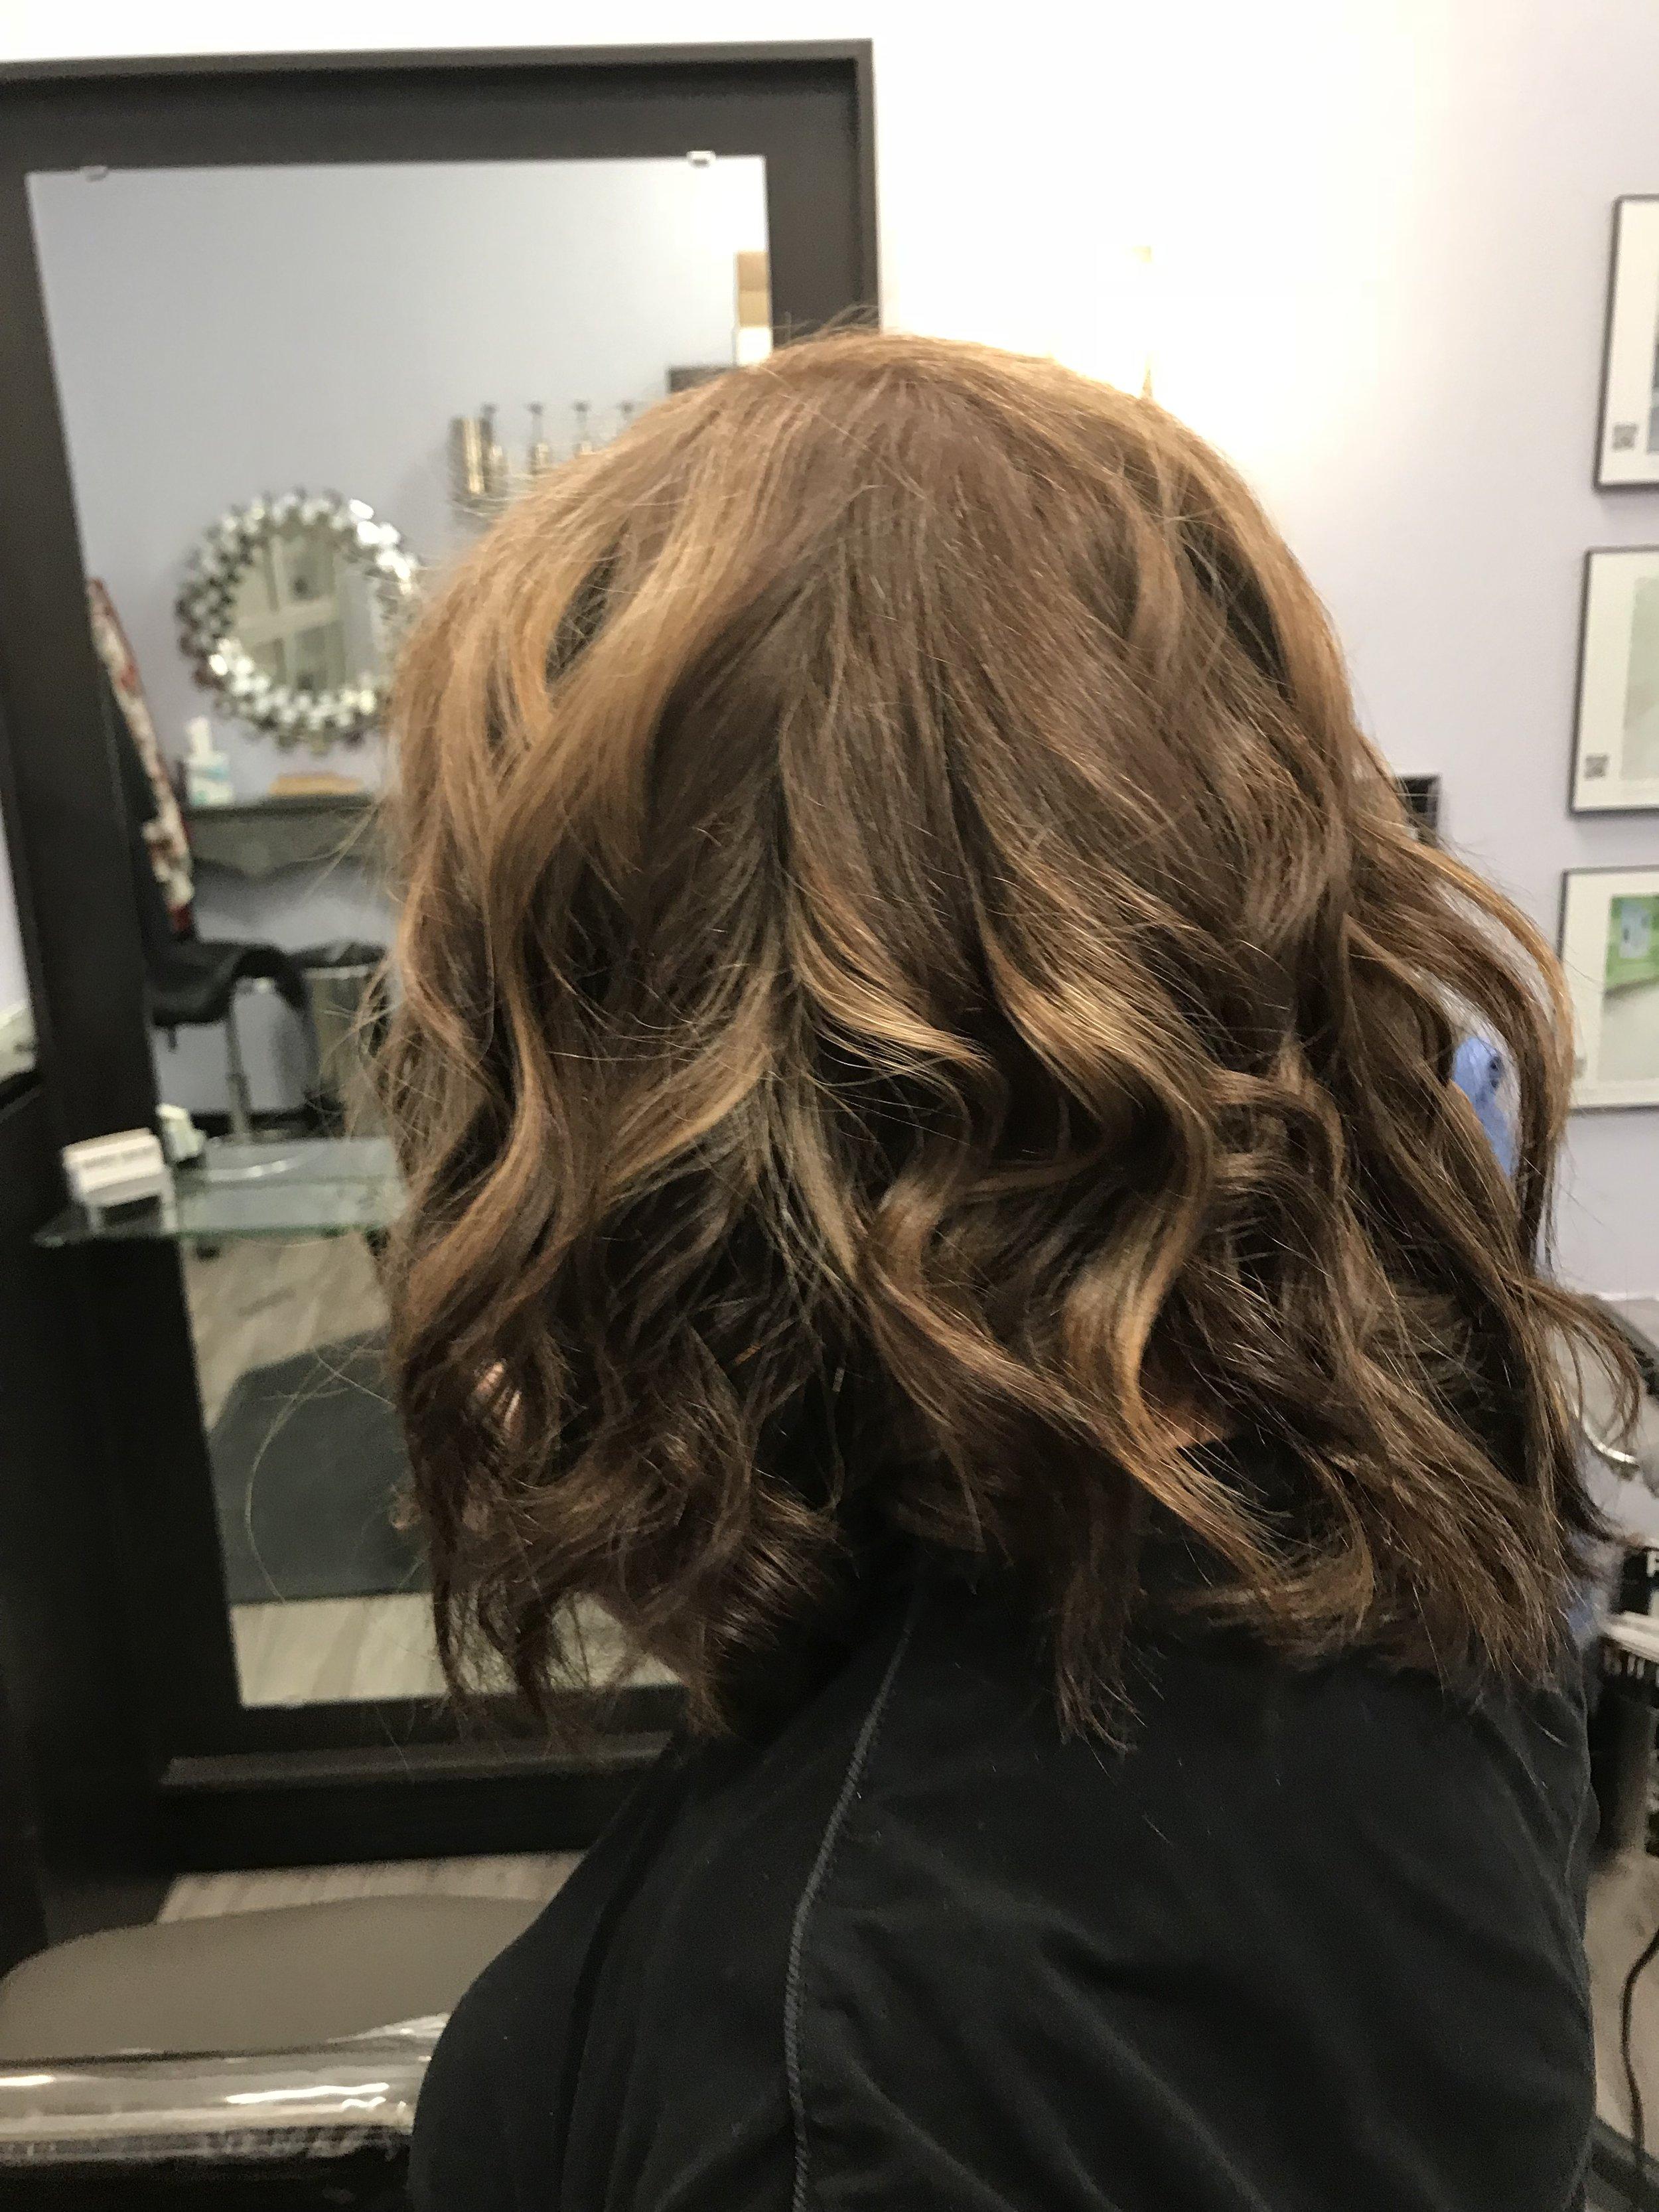 The back view of Linda's balayage procedure